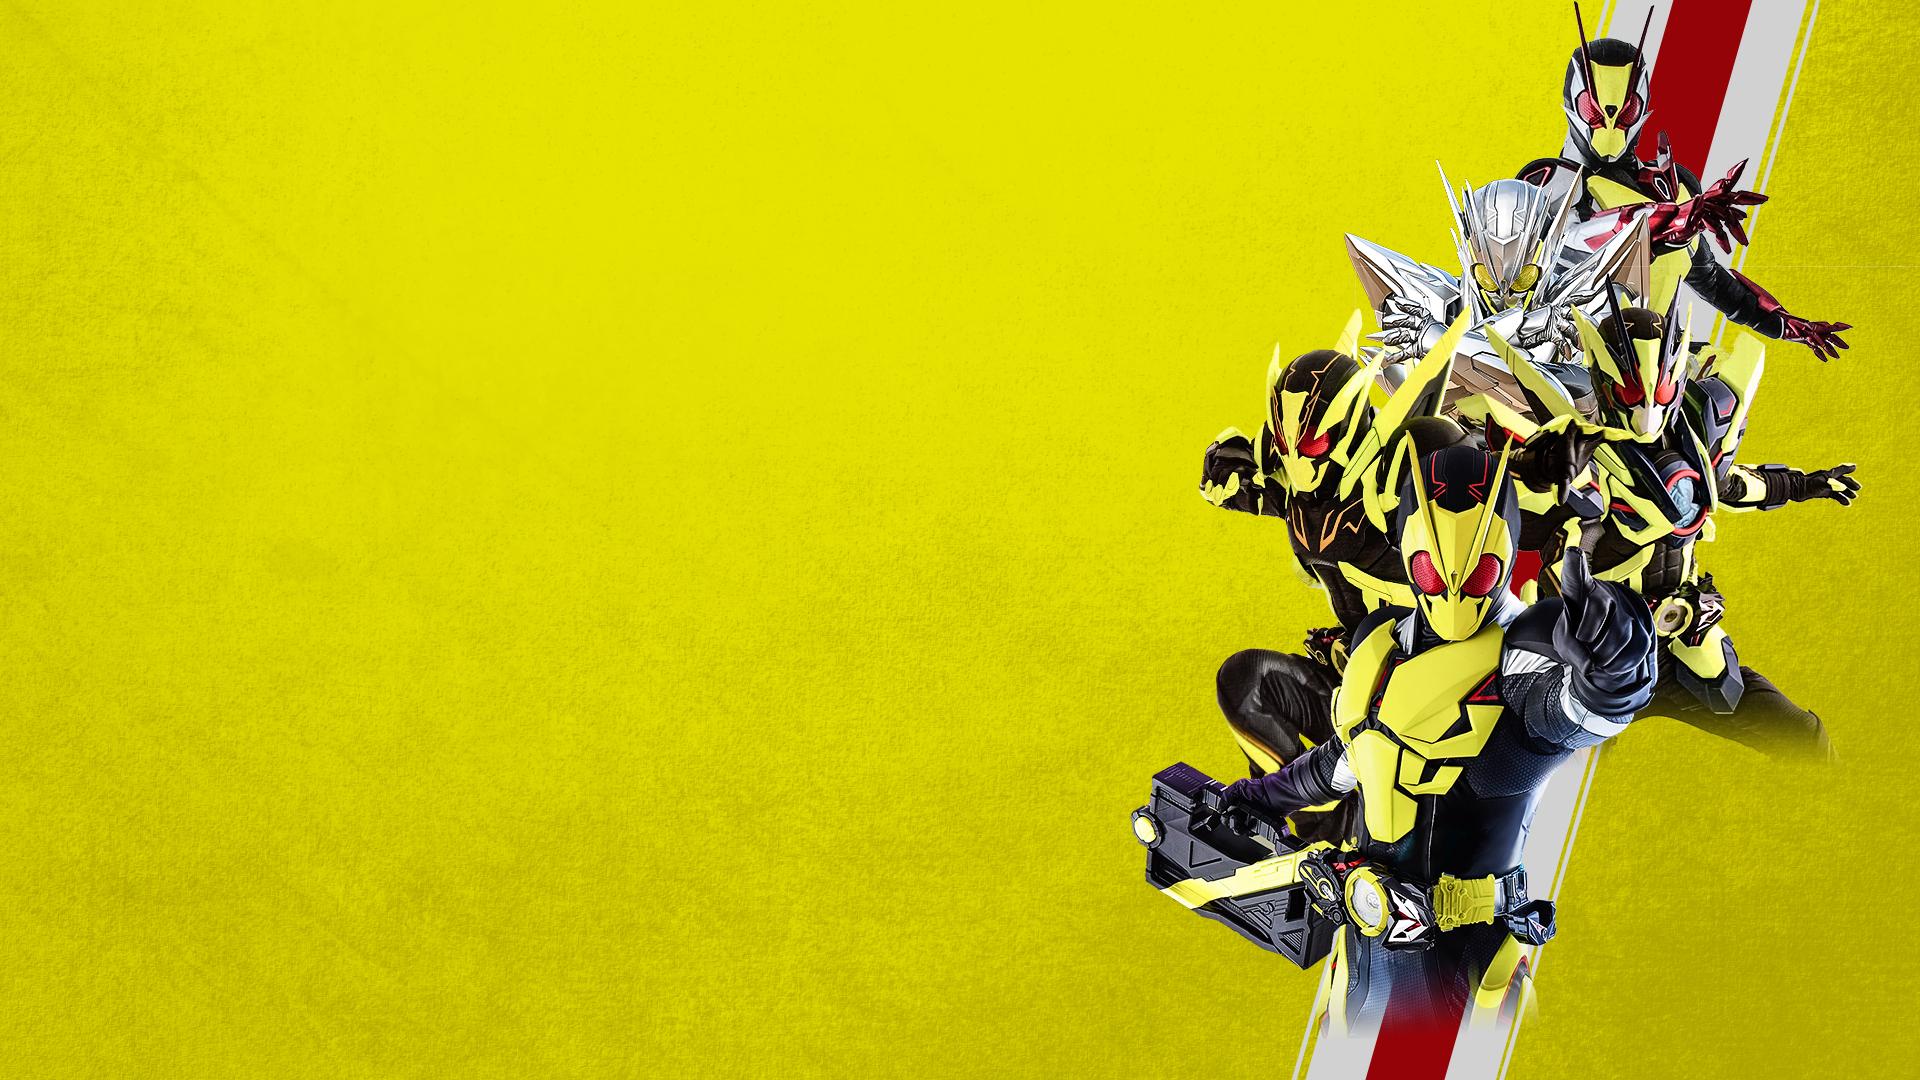 General 1920x1080 Kamen Rider Zero One kamen rider zero two shining assault form metal cluster hopper kamen rider tokusatsu